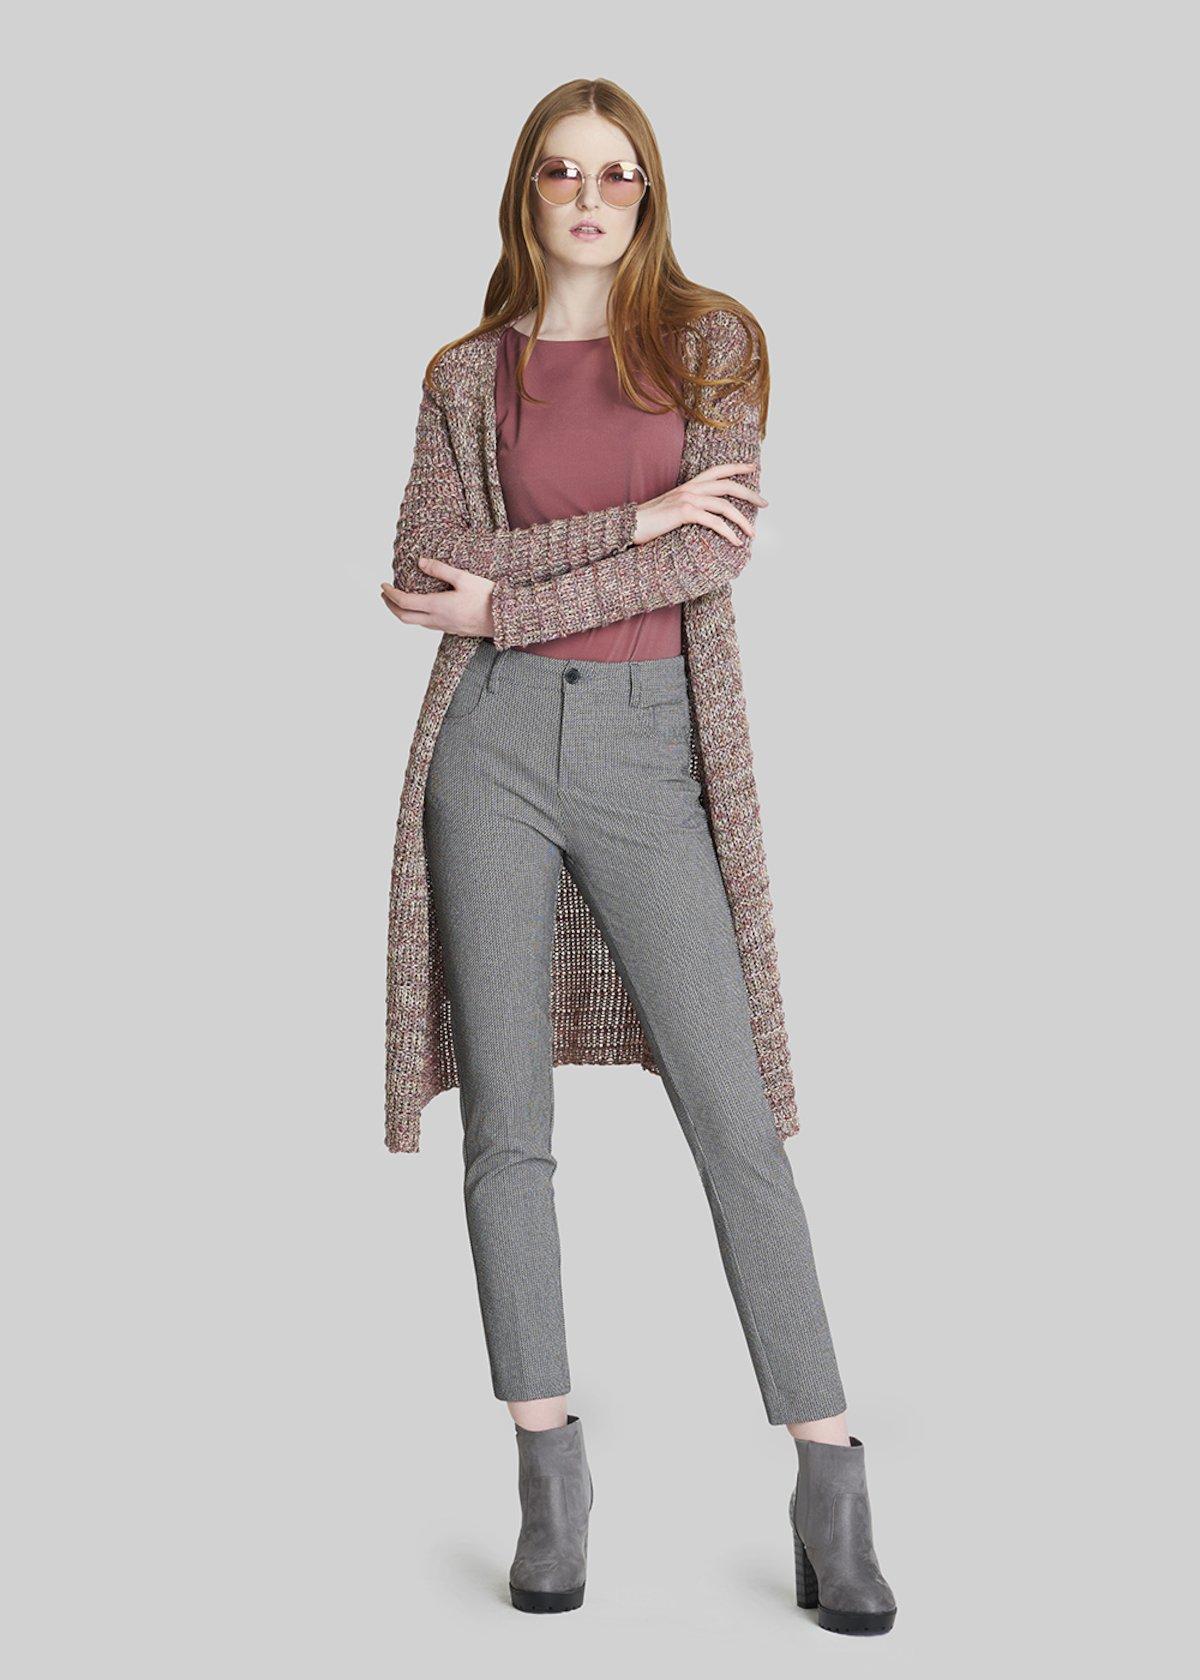 Chrissy long sleeve long Cardigan - Ciclamino / Violet Lurex